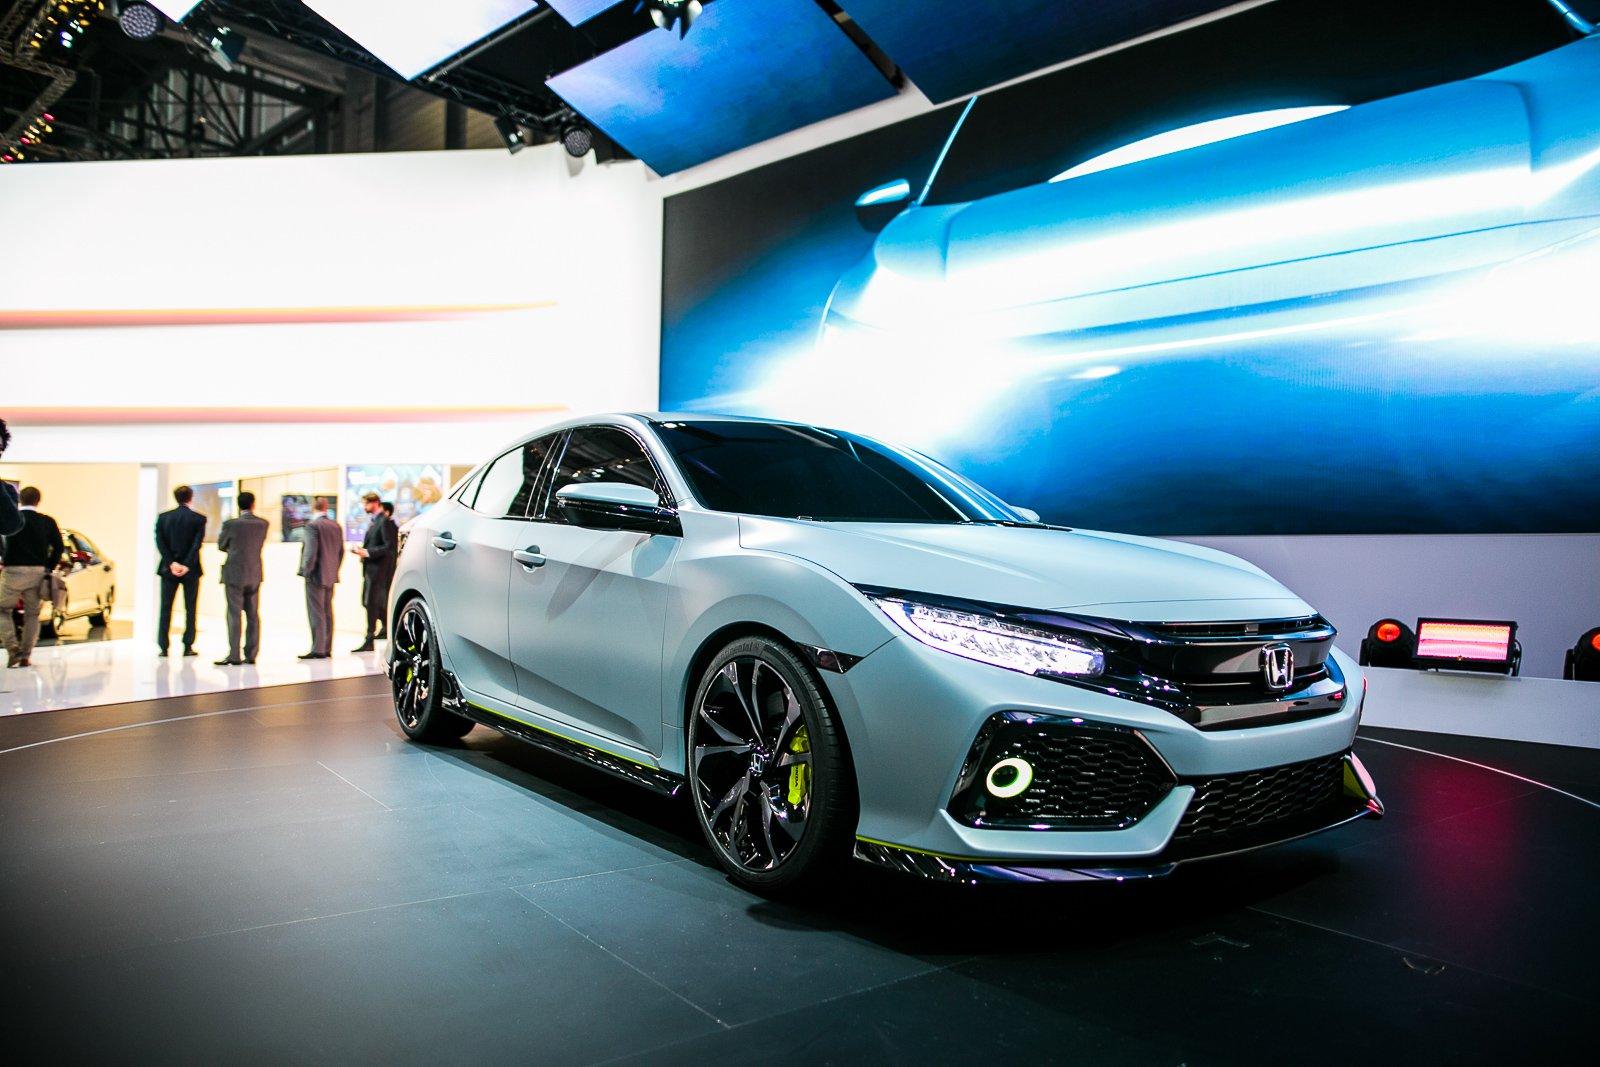 2017-Honda-Civic-Coupe-7